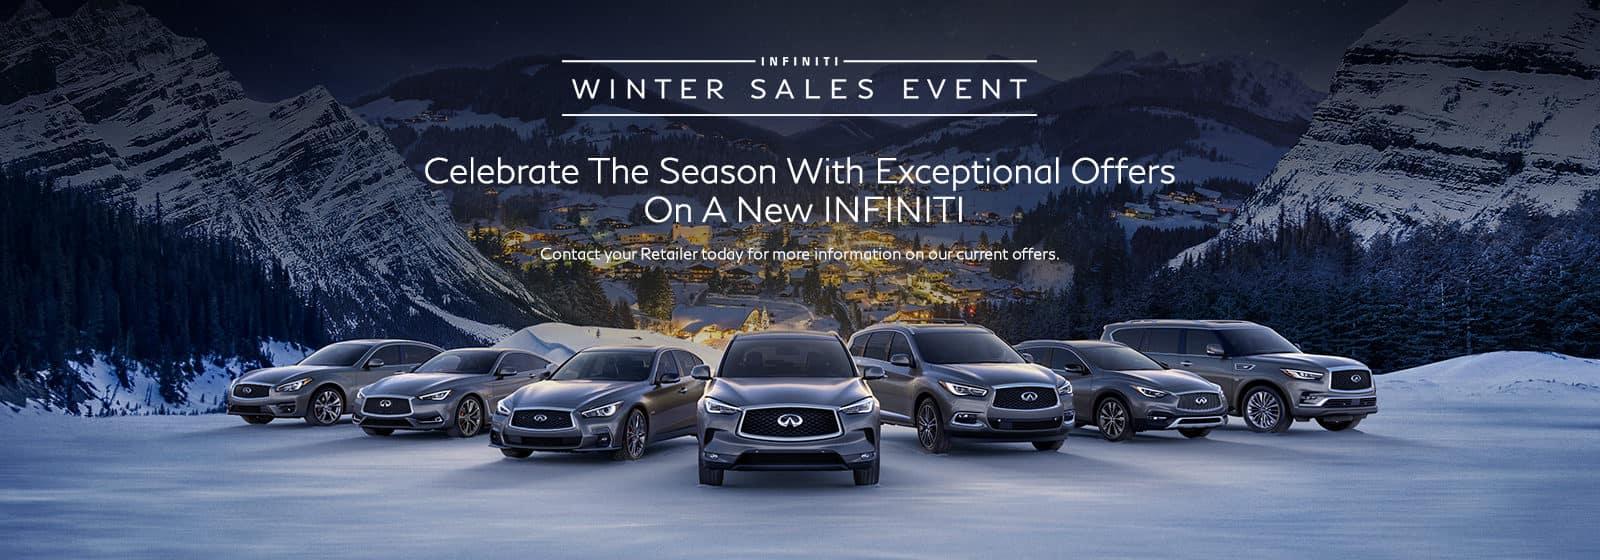 INFINITI Winter Sales Event